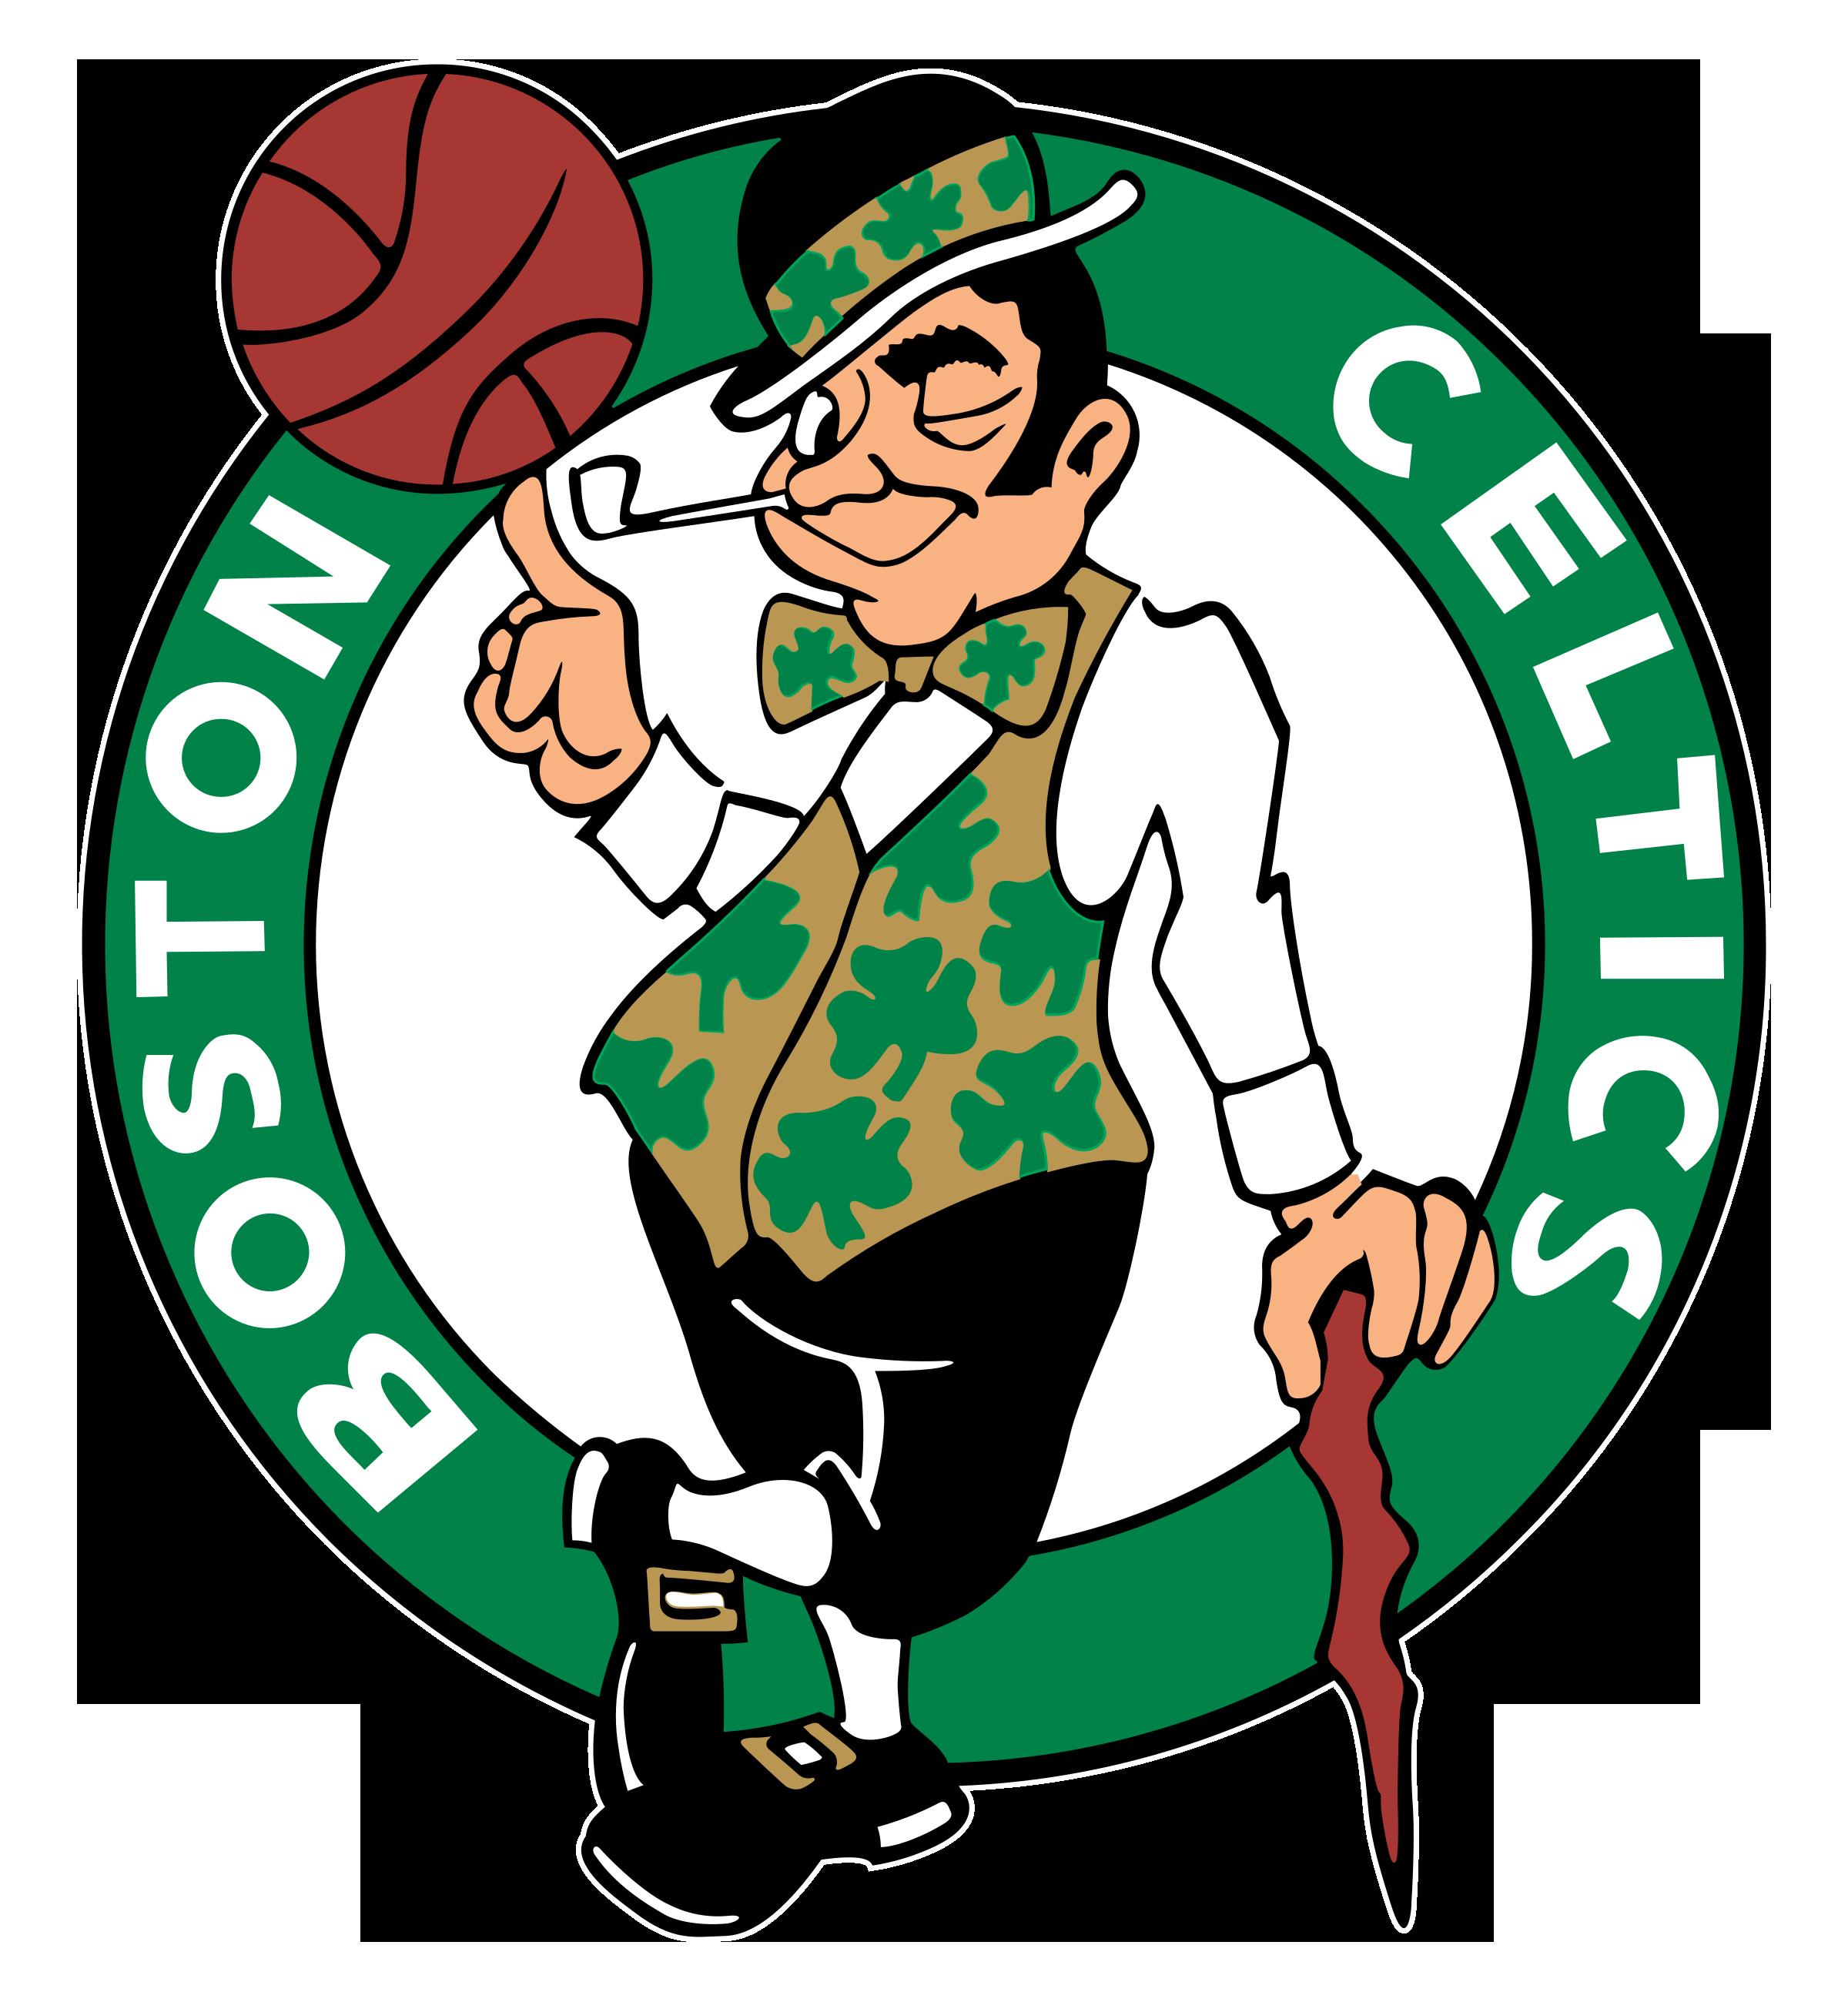 Boston celtics logo png. Leprechaun clipart vector